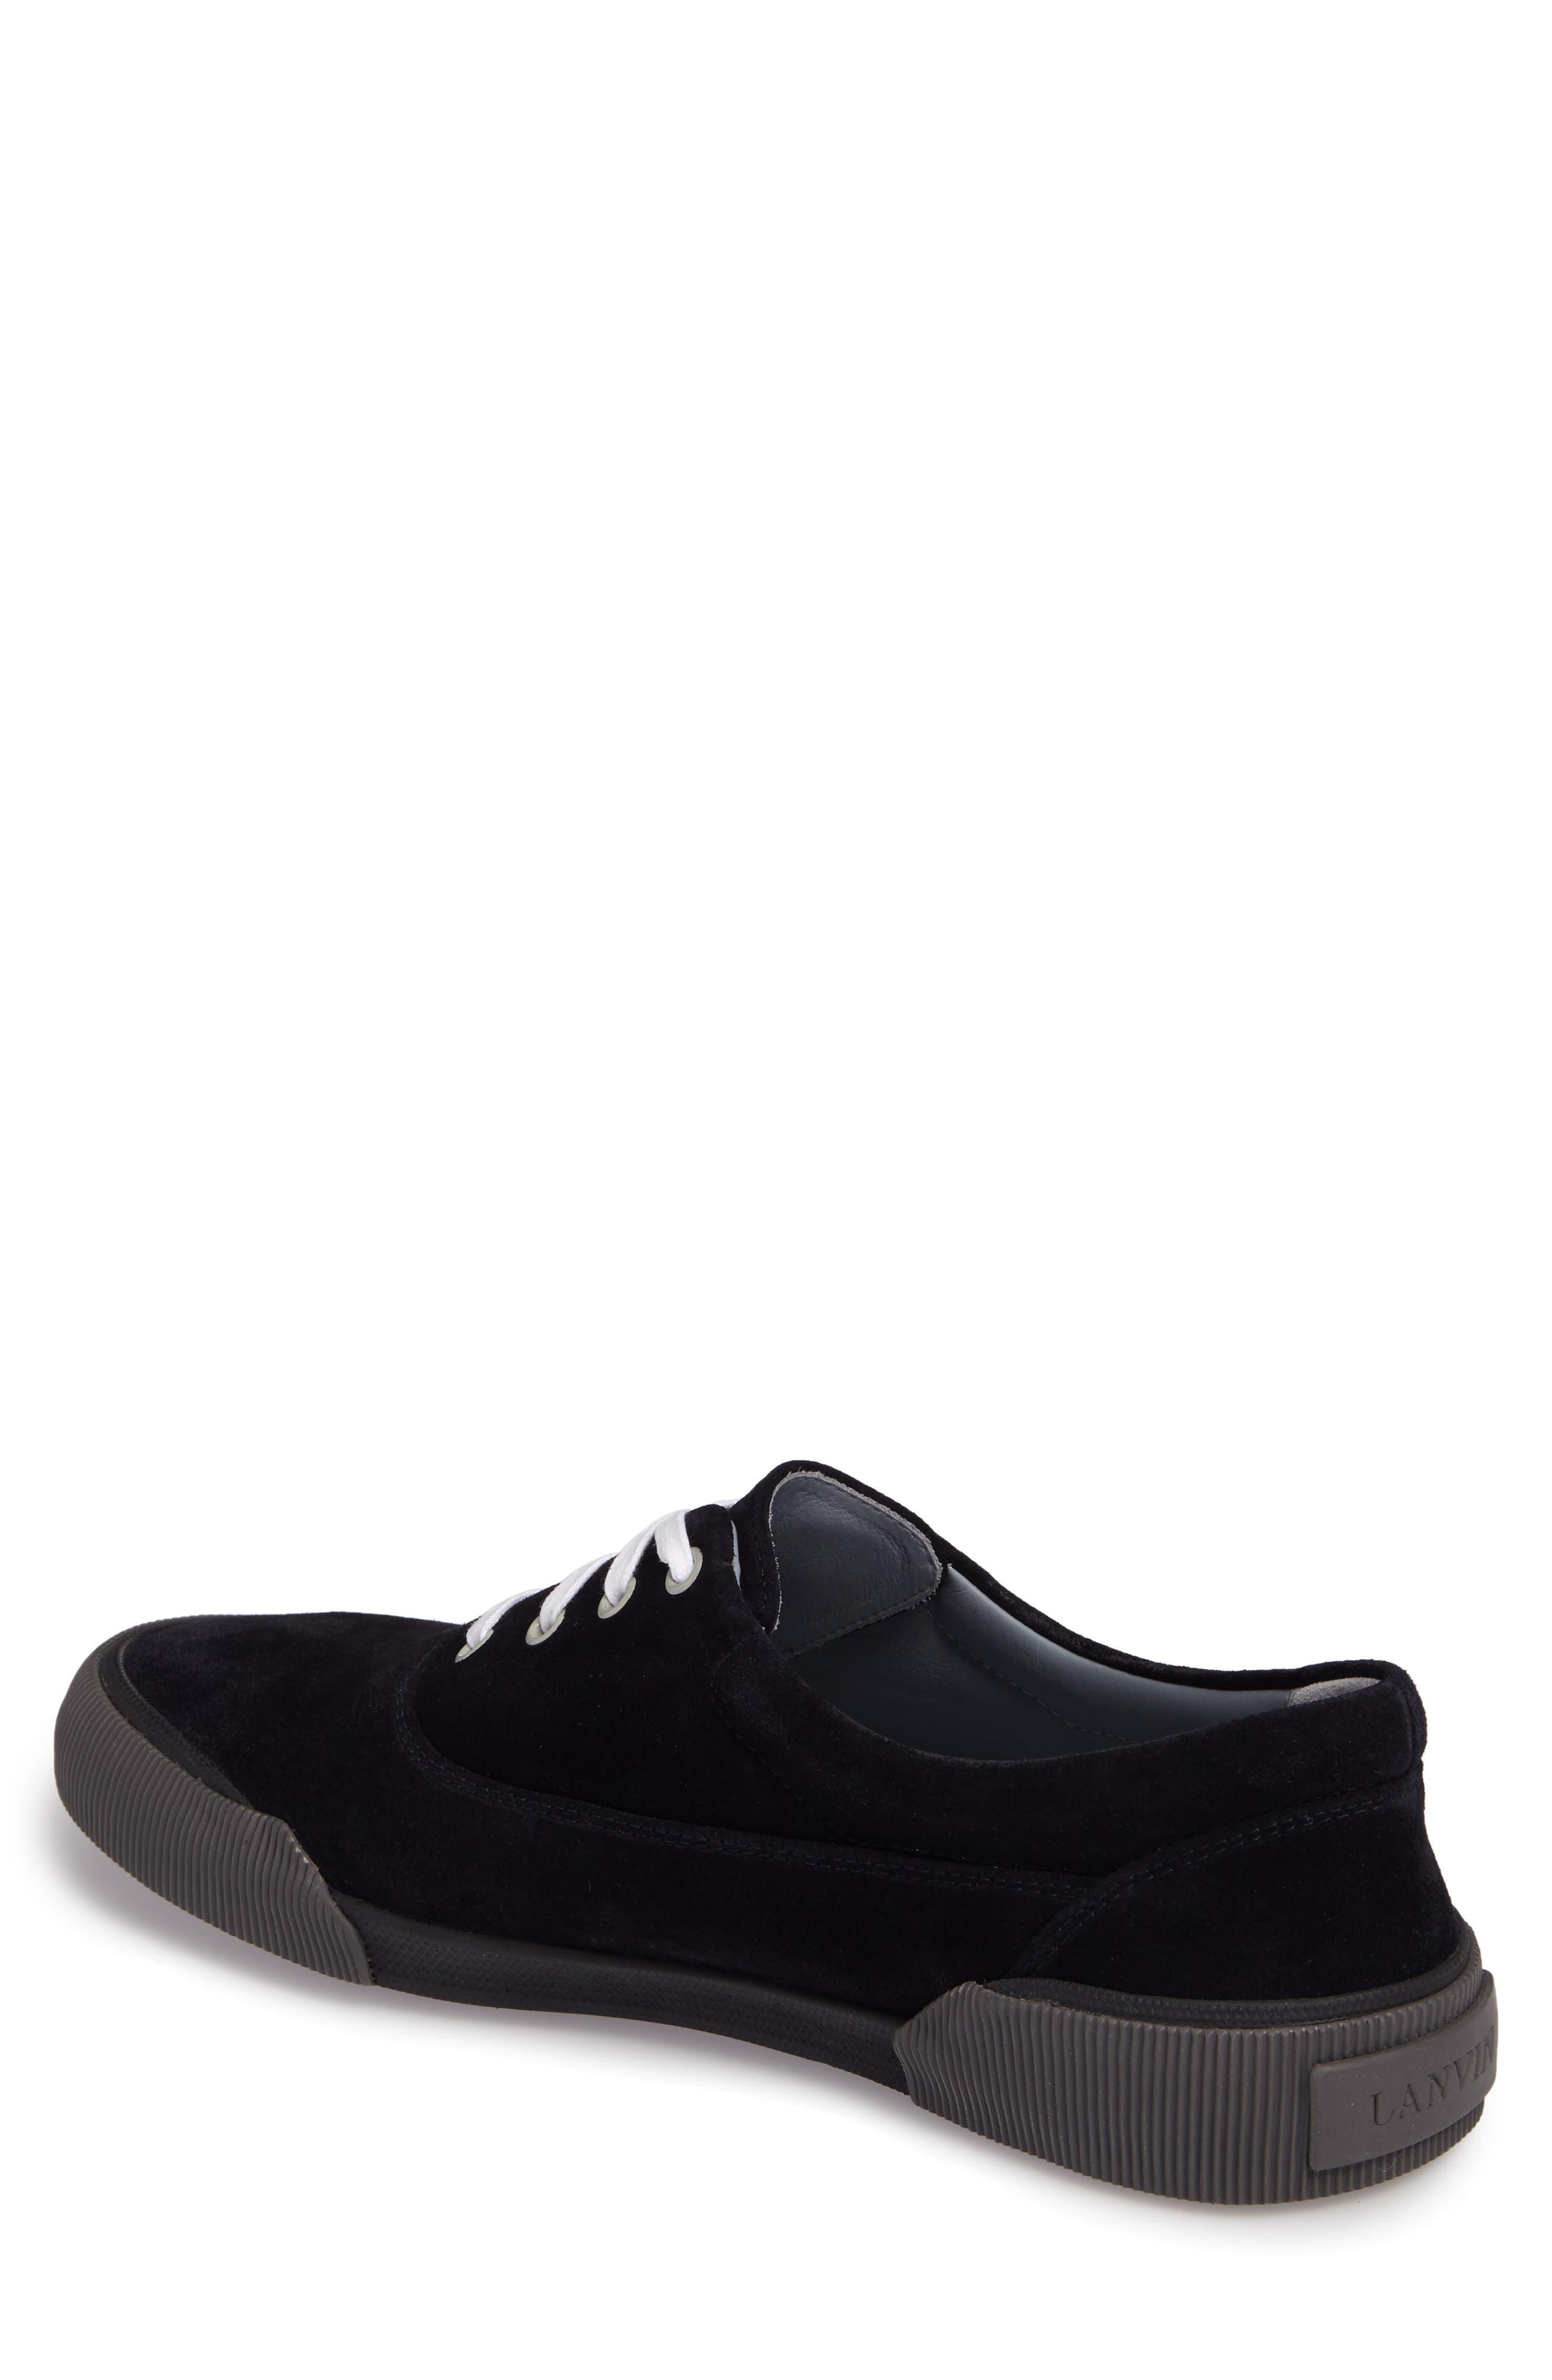 Alternate Image 2  - Lanvin Suede Sneaker (Men)